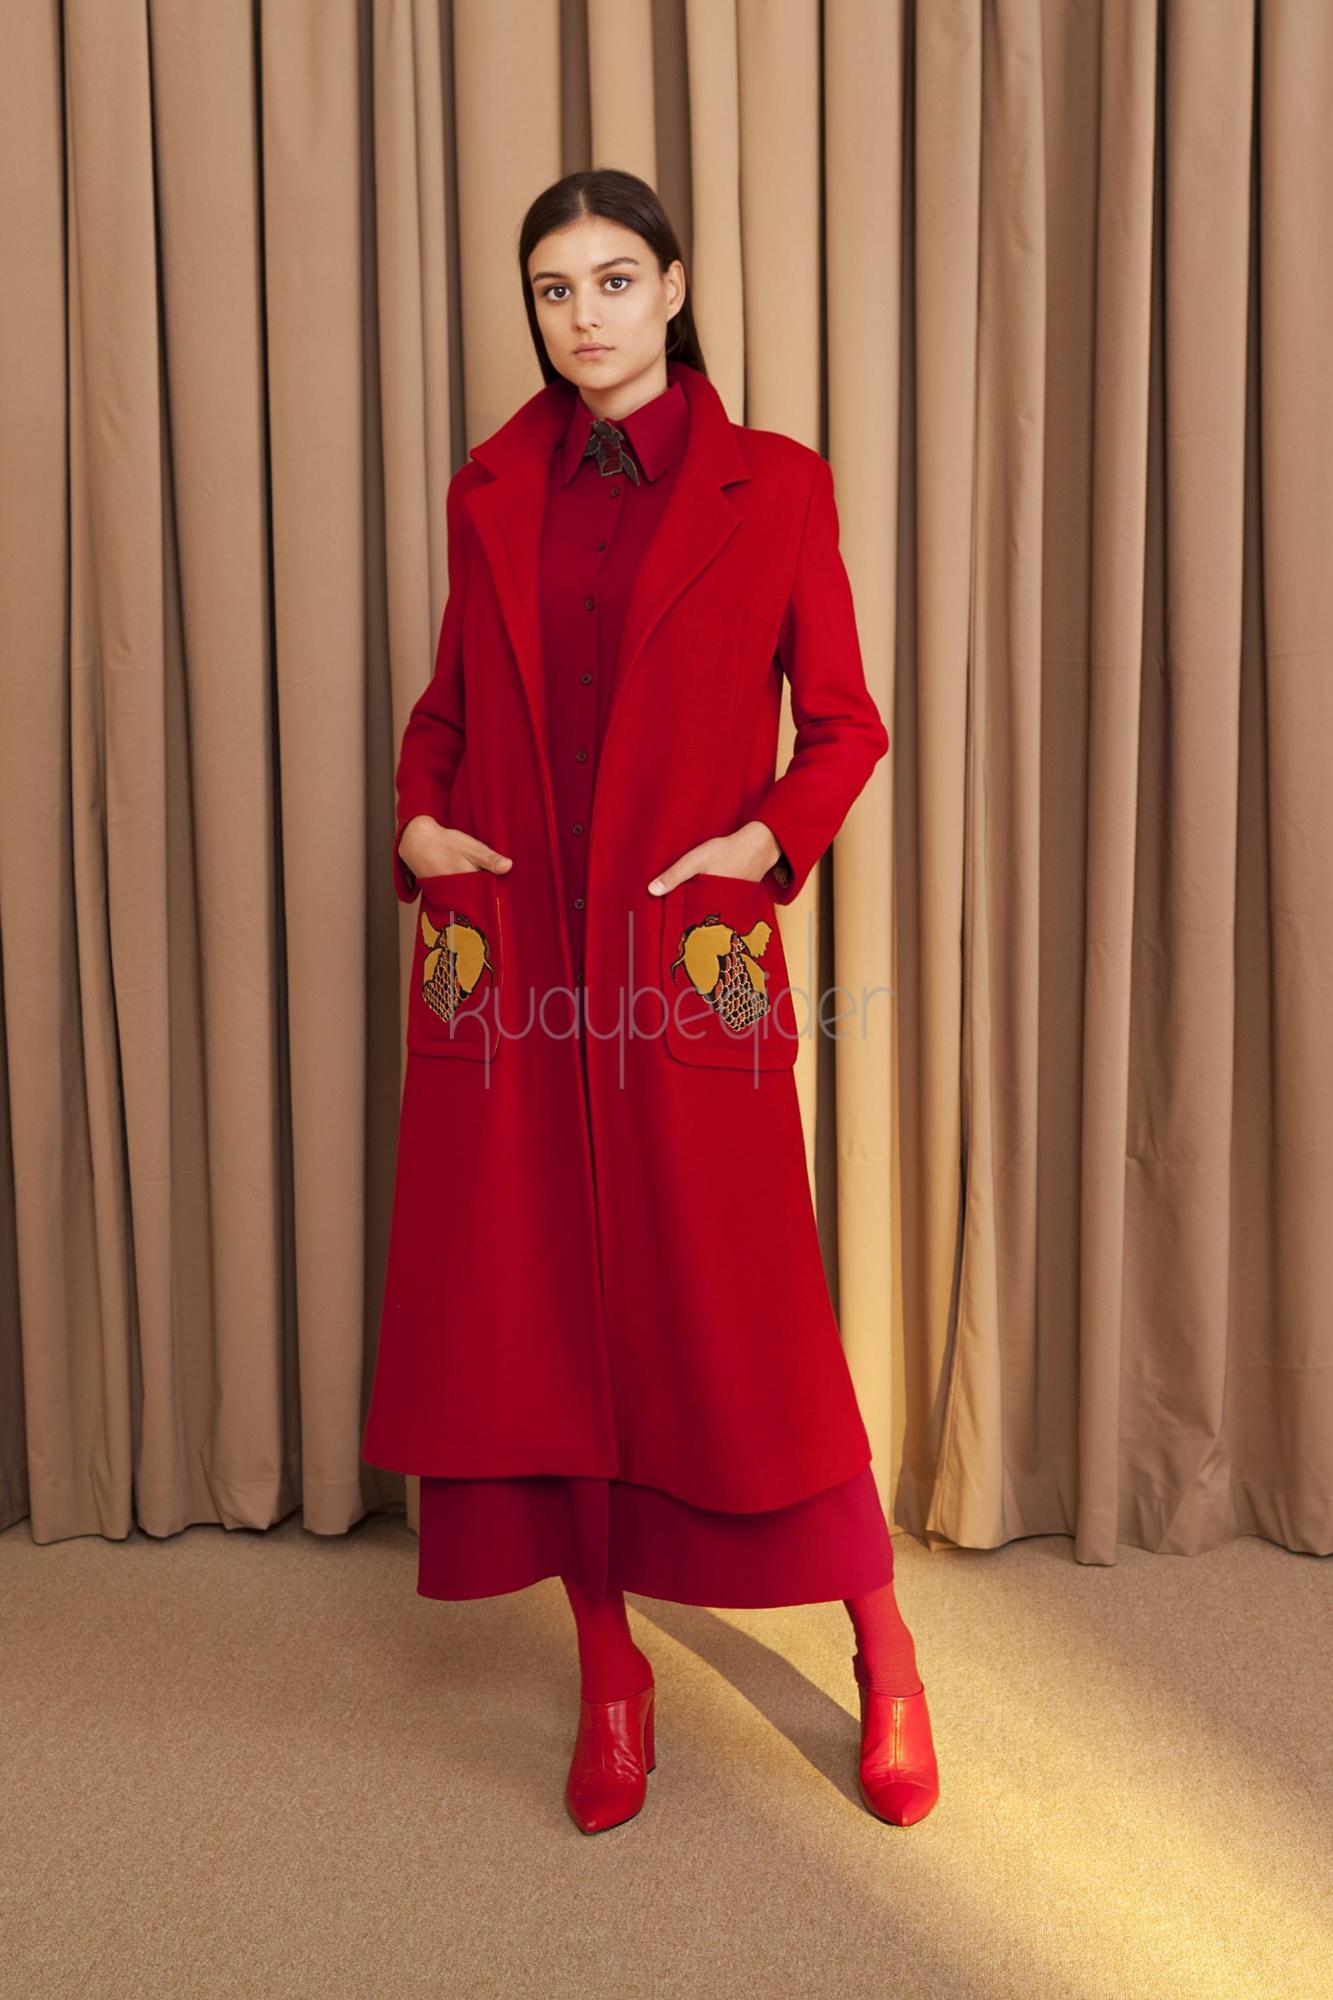 Kuaybe Gider - 7070 Kaşe Palto Kırmızı